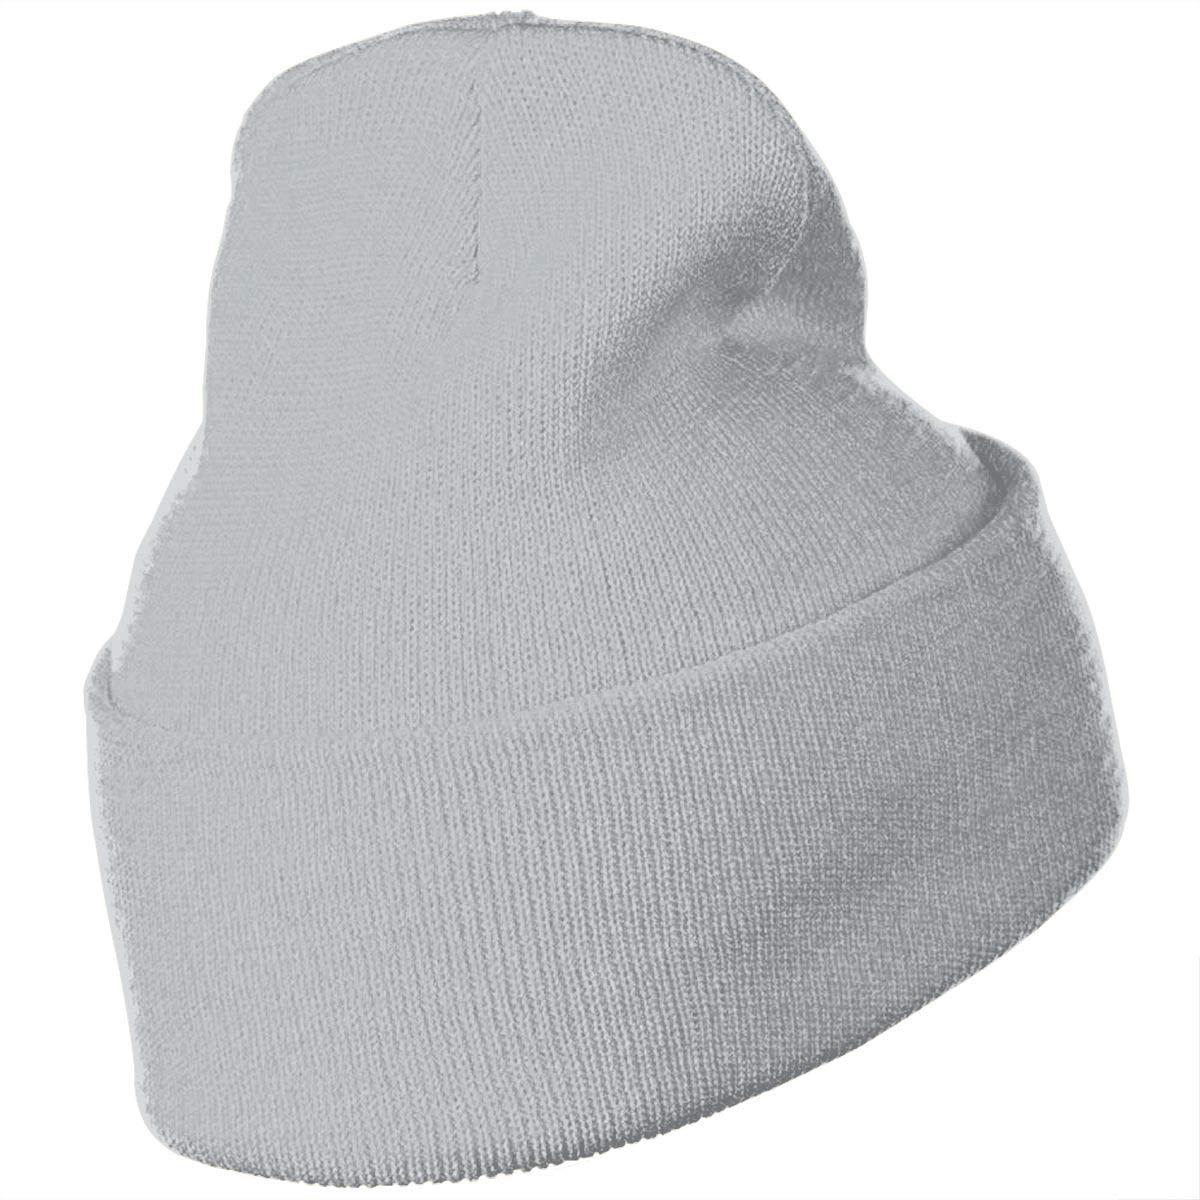 Surfer Surfing Silhouette Men /& Women Knit Hats Stretchy /& Soft Ski Cap Beanie